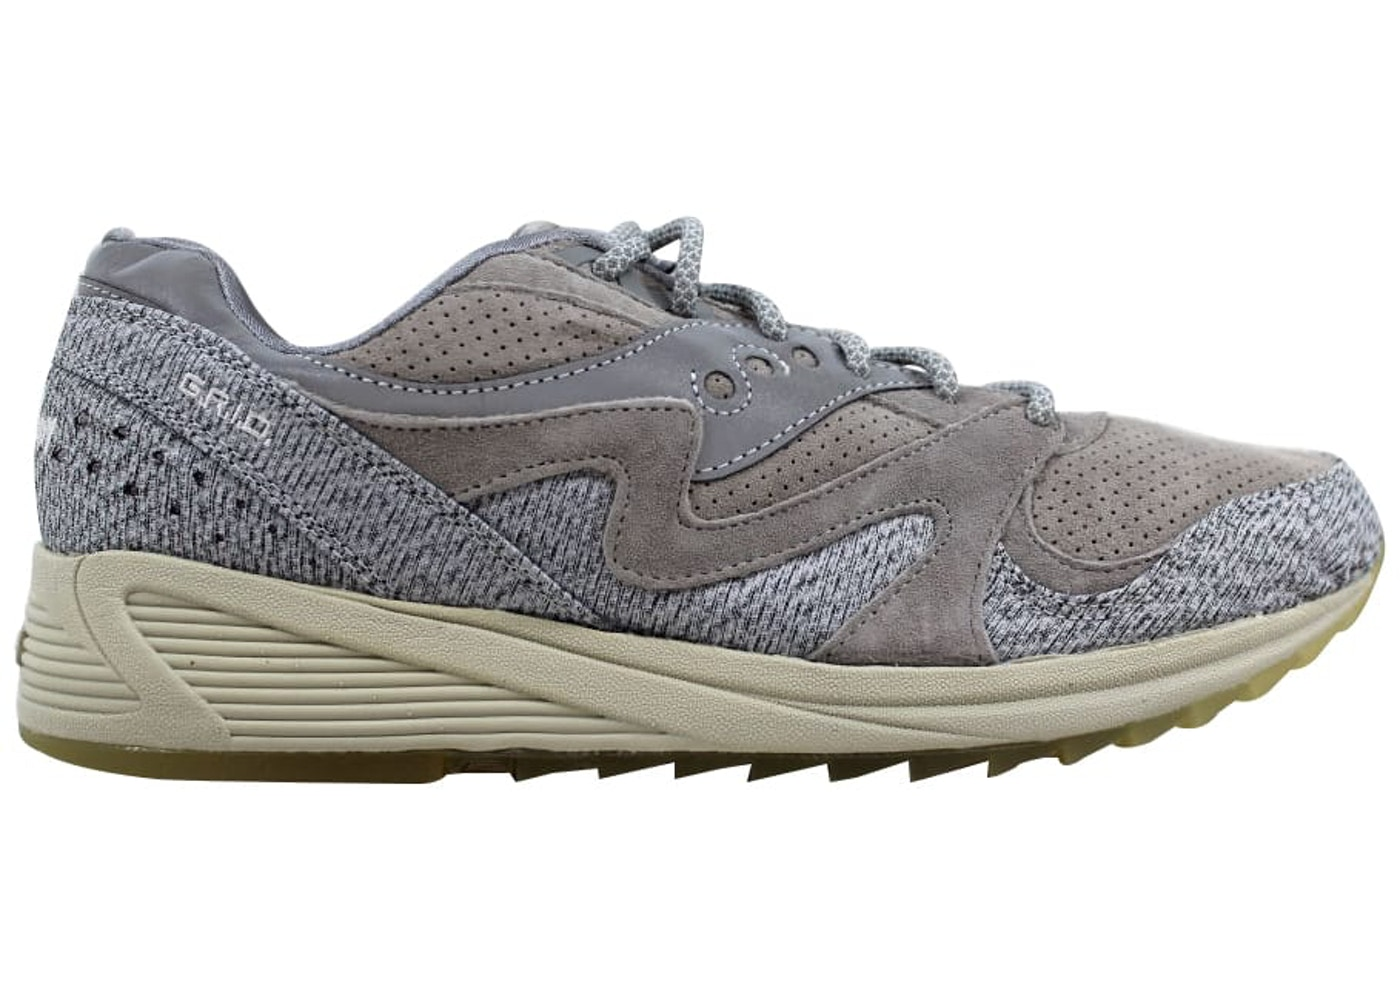 142a6380 Saucony Size 8 Shoes - New Lowest Asks